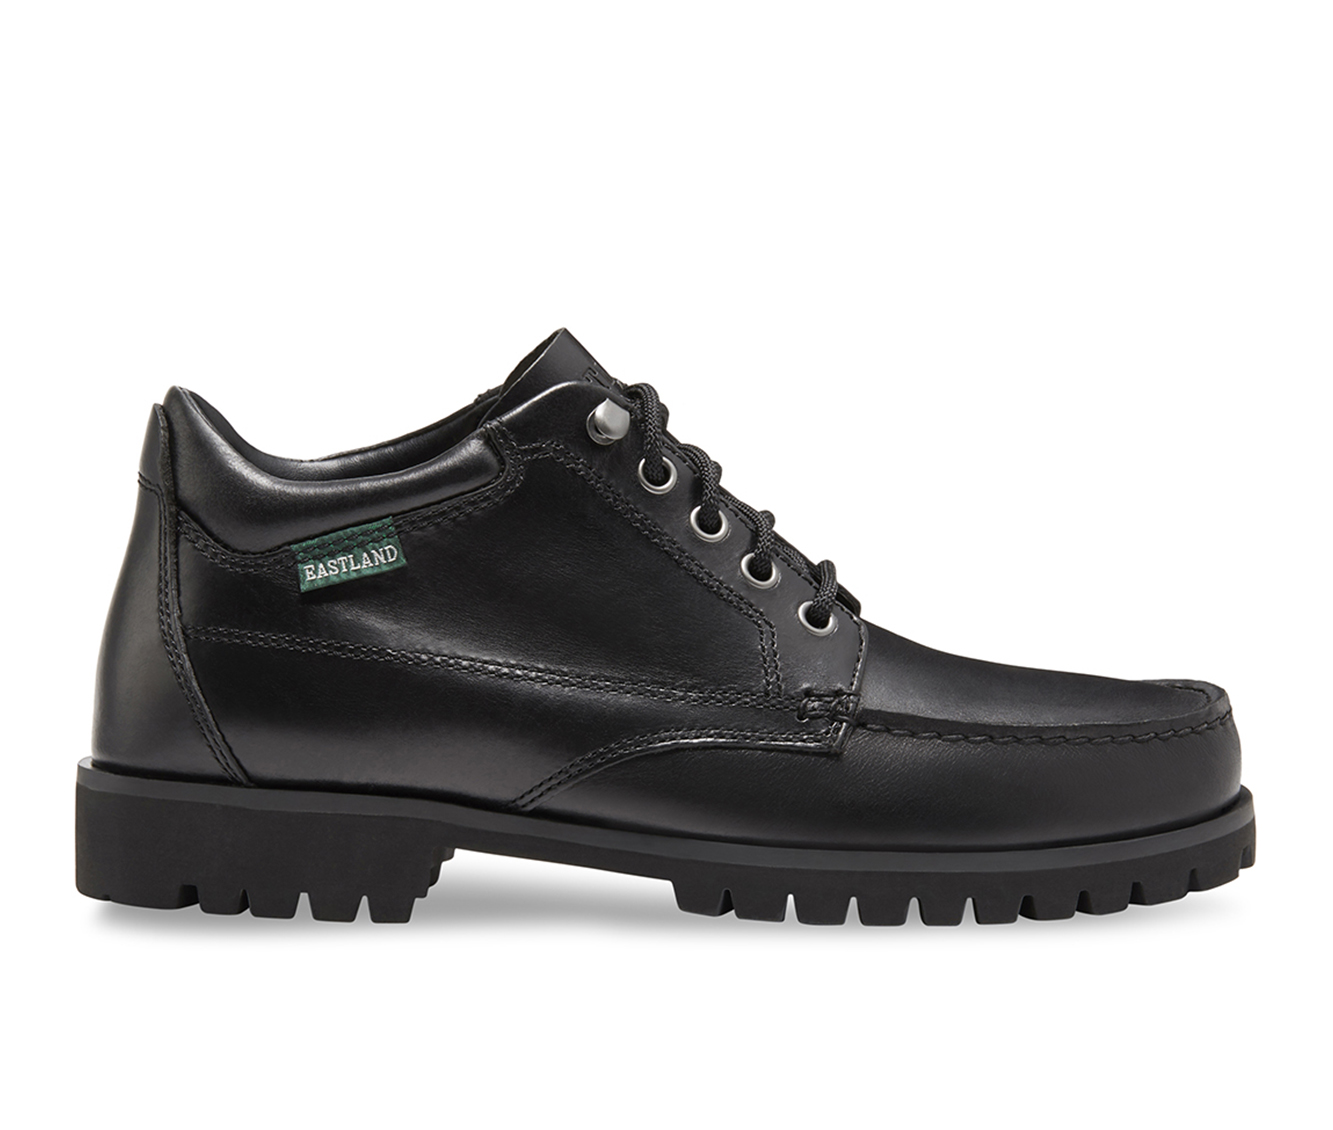 Eastland Brooklyn Moc Toe Men's Boots (Black Leather)